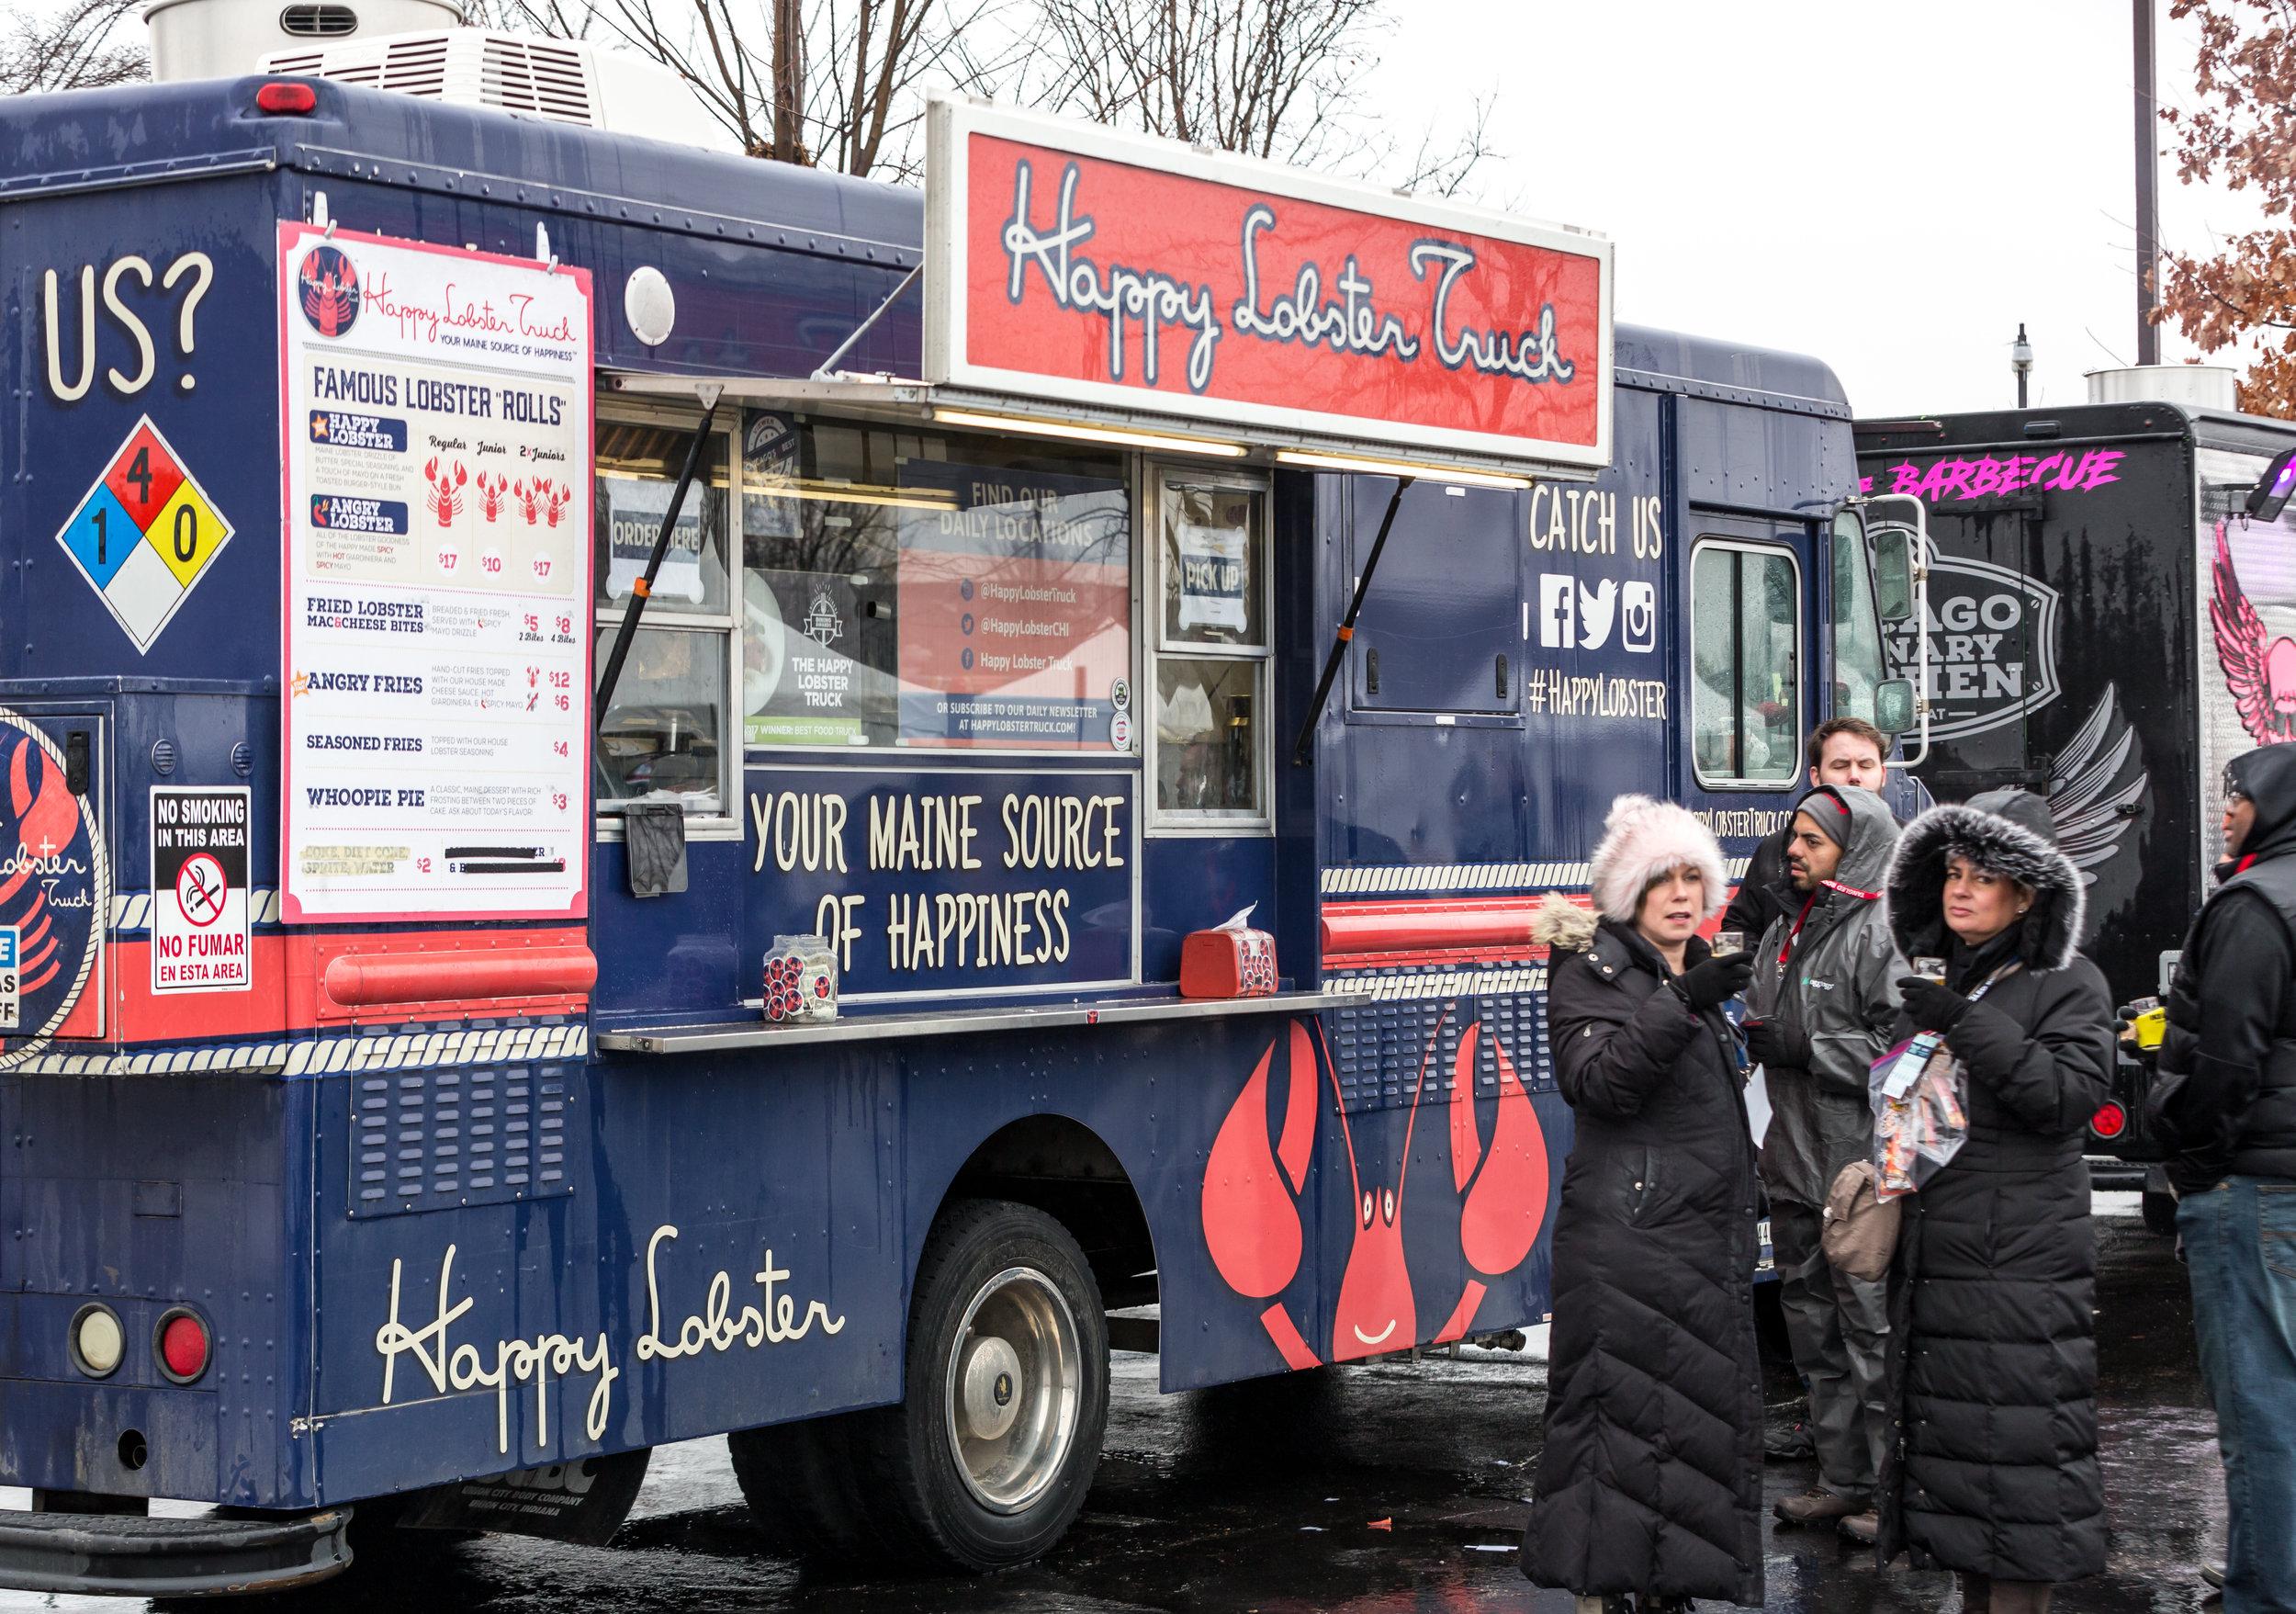 - 10 food trucks